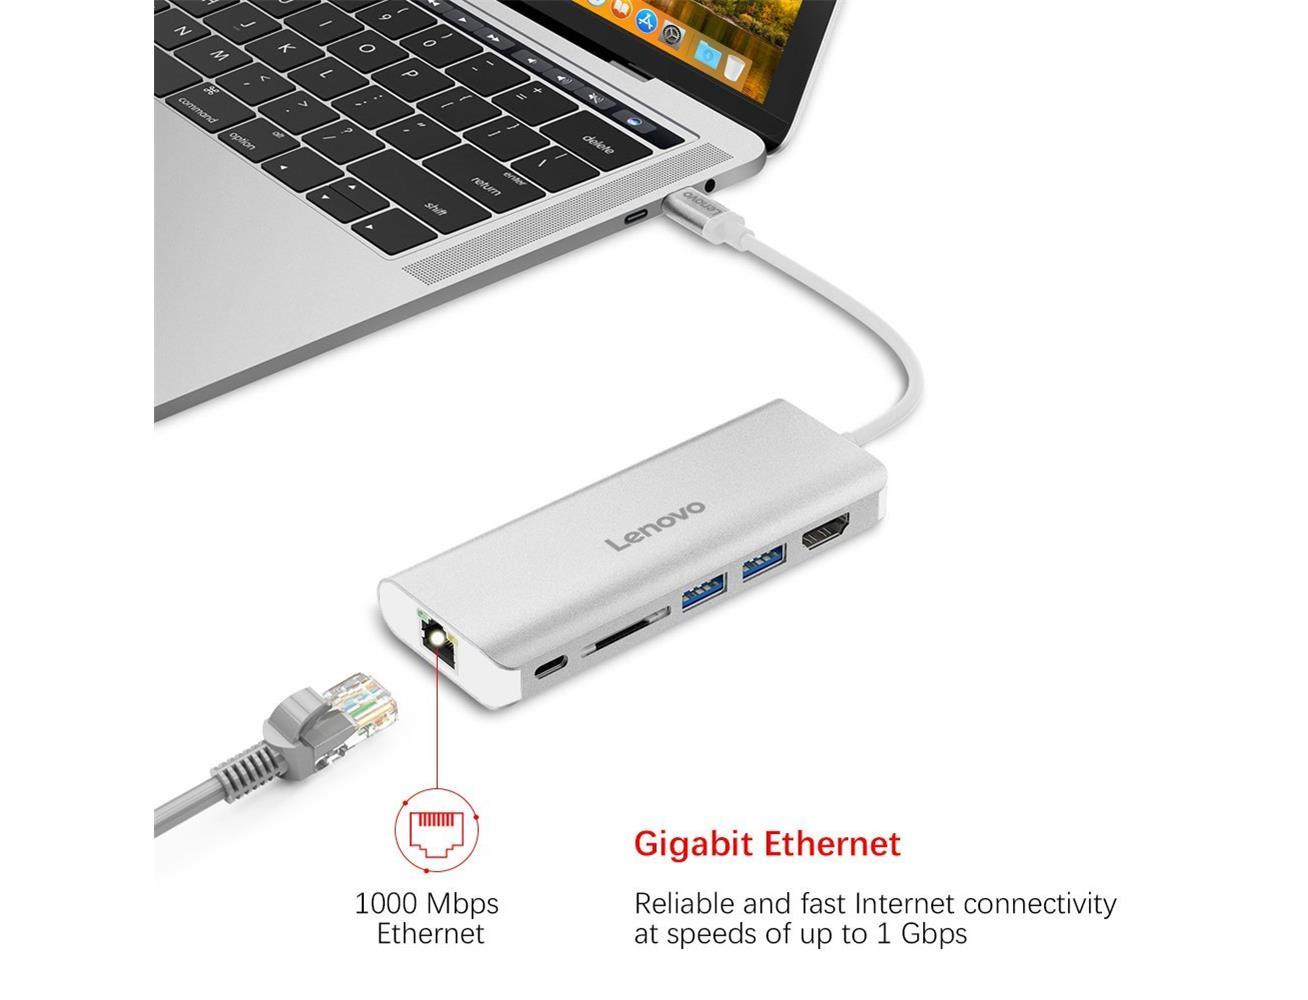 Lenovo USB-C Hub, Aluminum Type C Adapter With HDMI Port - Silver